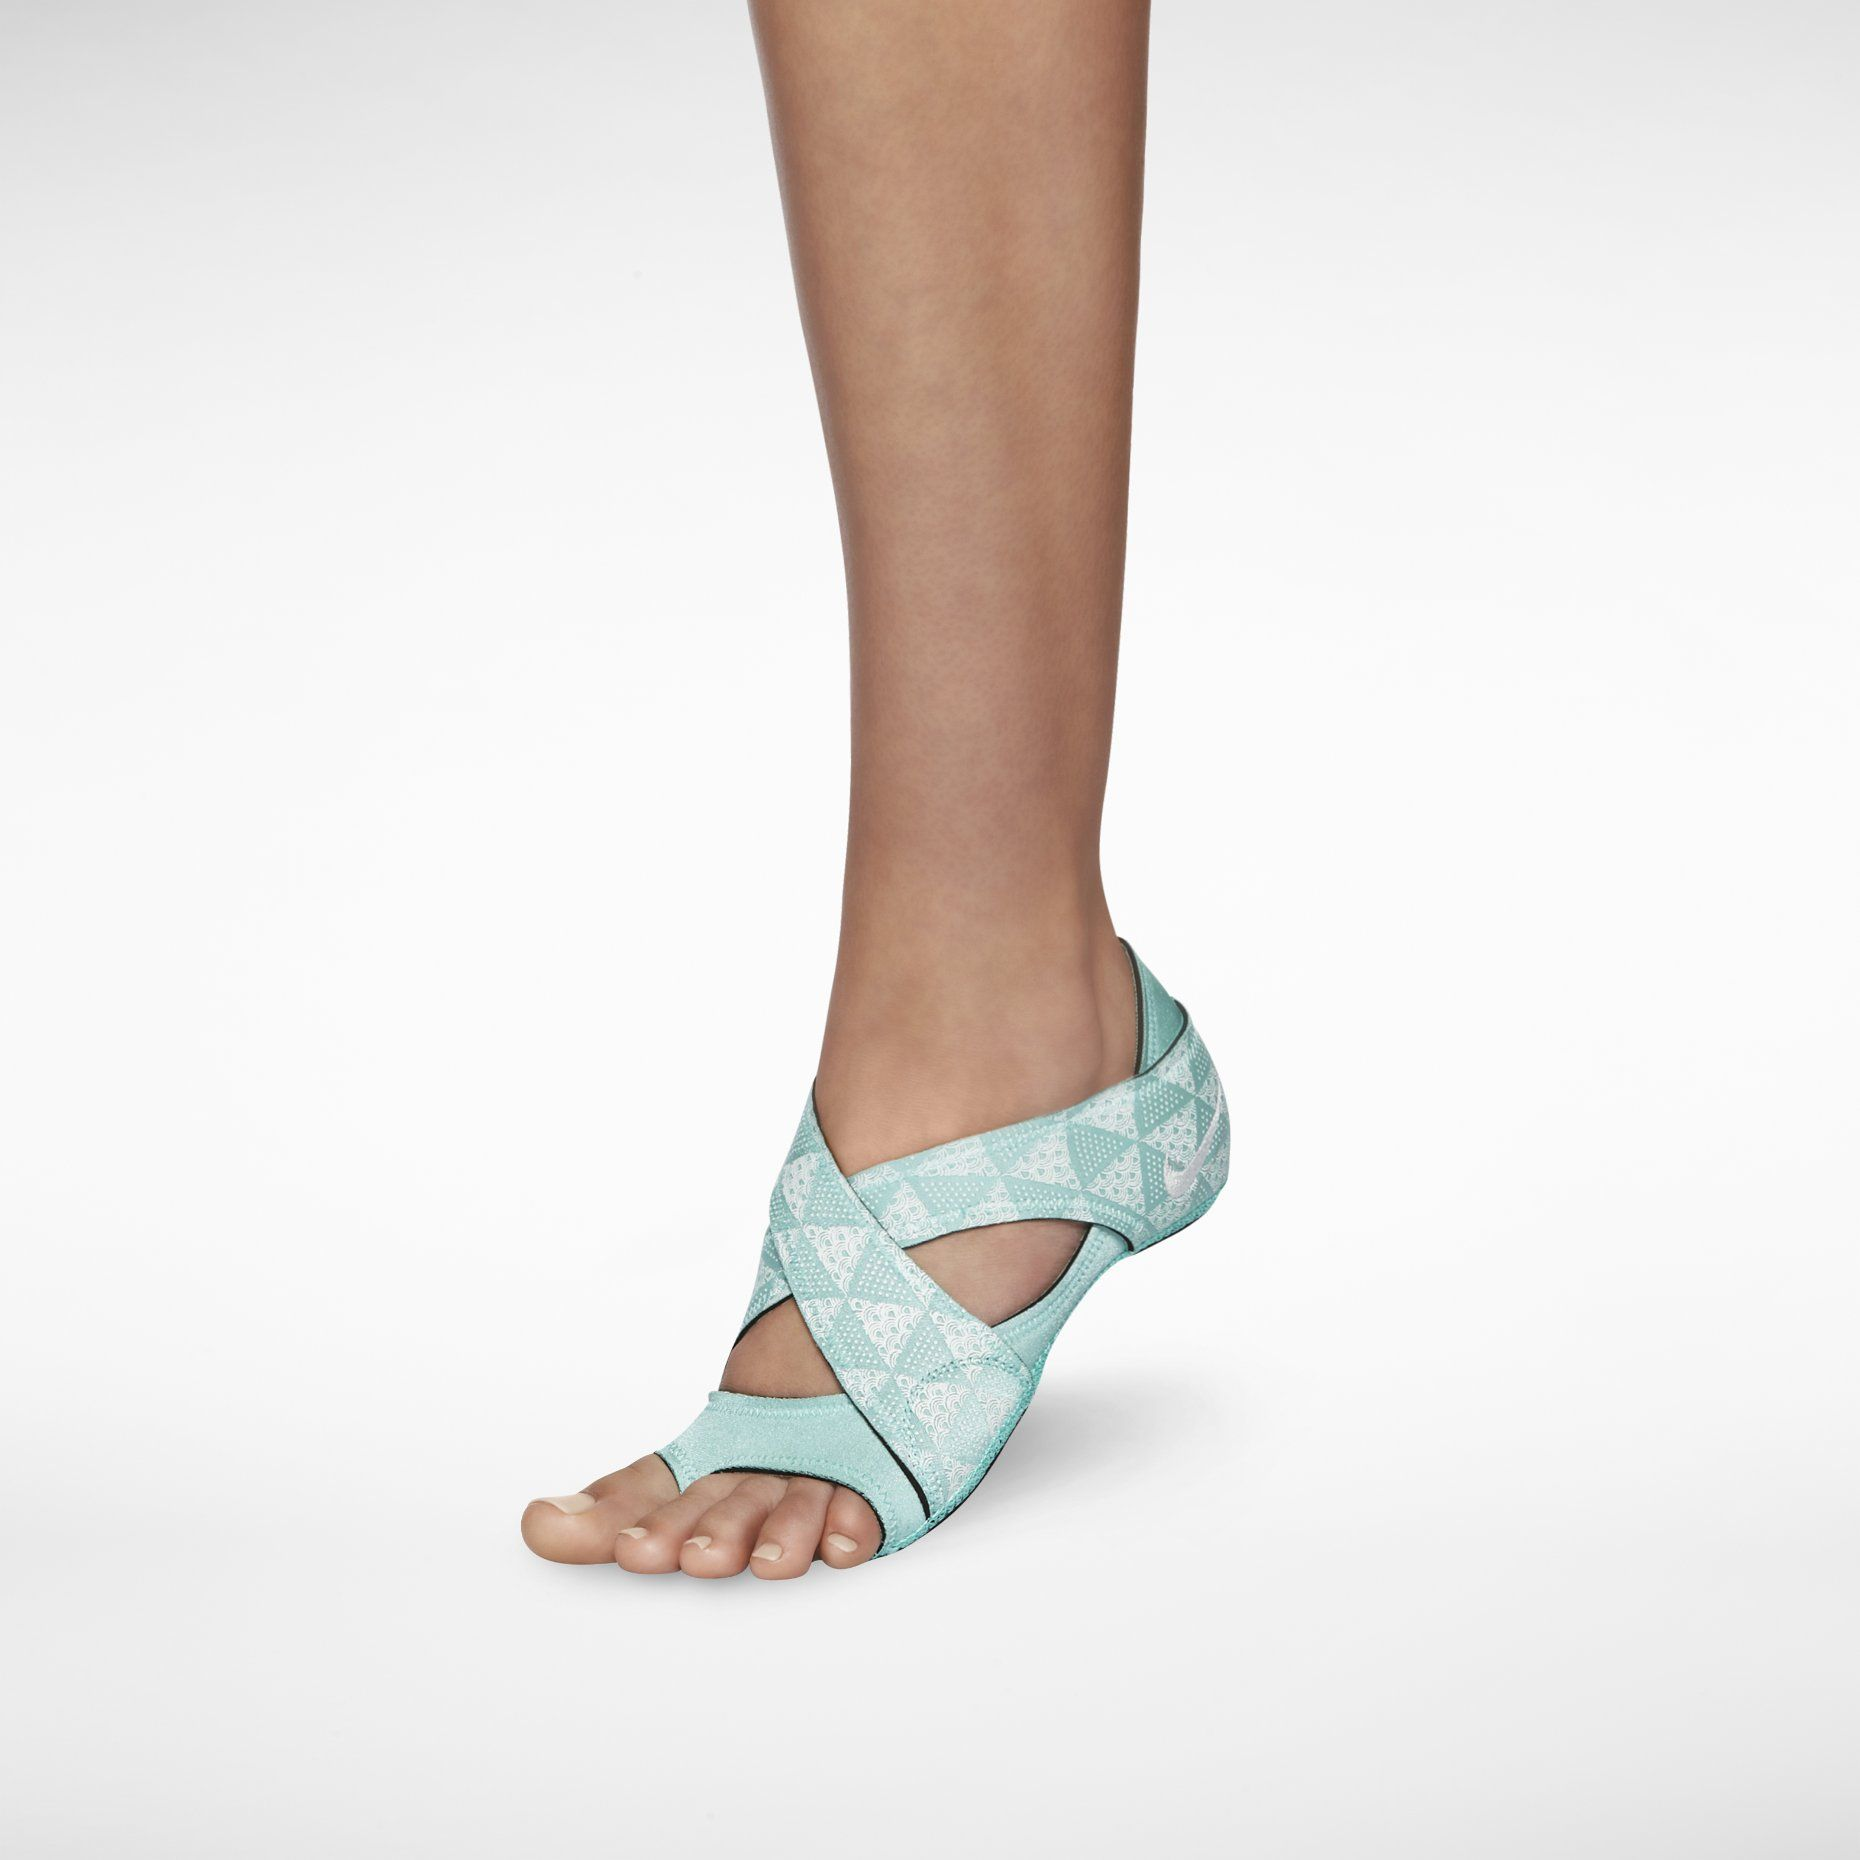 Fitness tools nike studio wraps - Nike Women S Yoga Socks Nike Studio Wrap Pack Women S Marathon Three Part